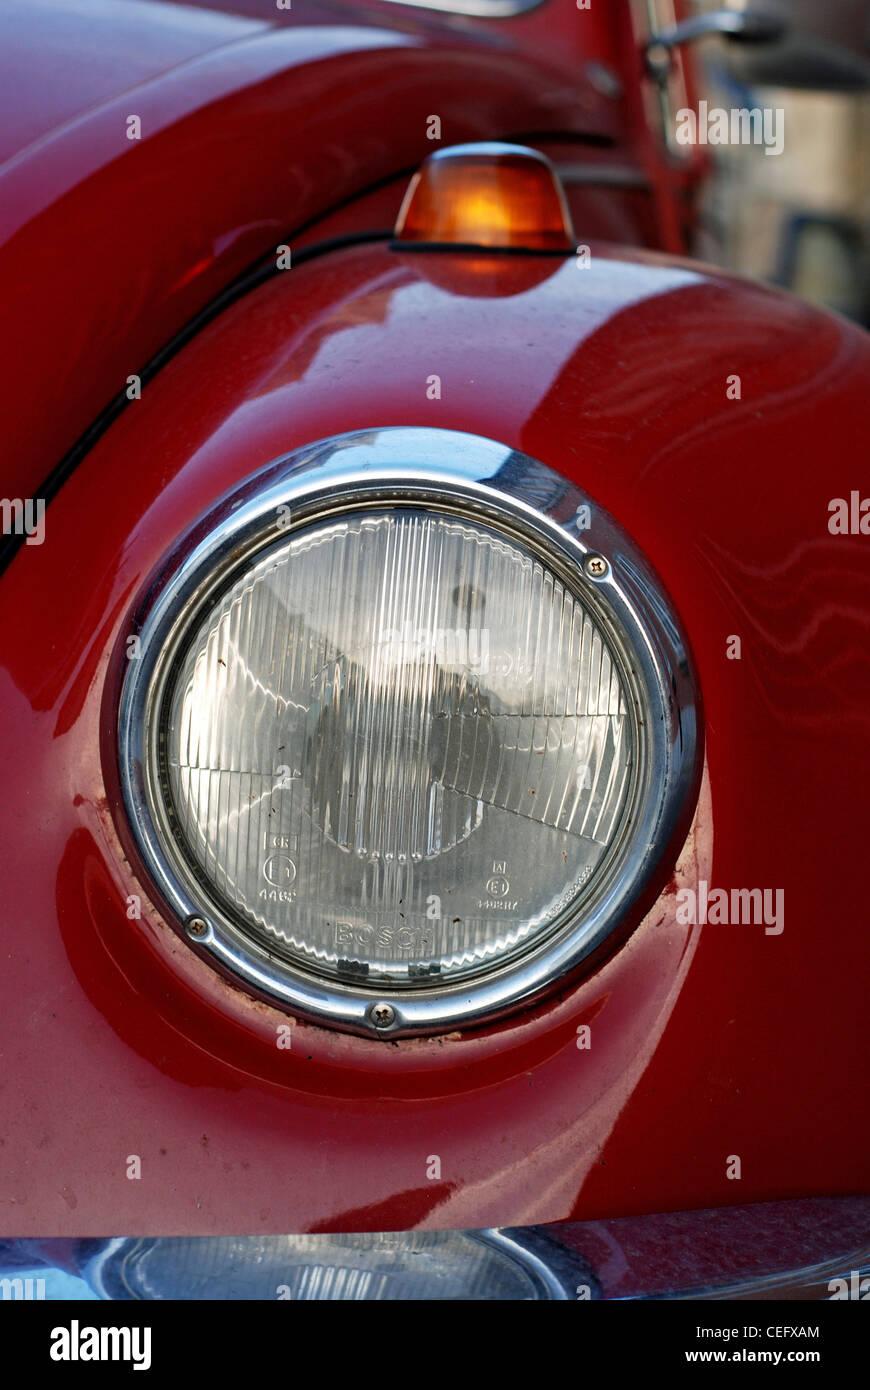 Old vintage classic VW Beatle car closeup - Stock Image